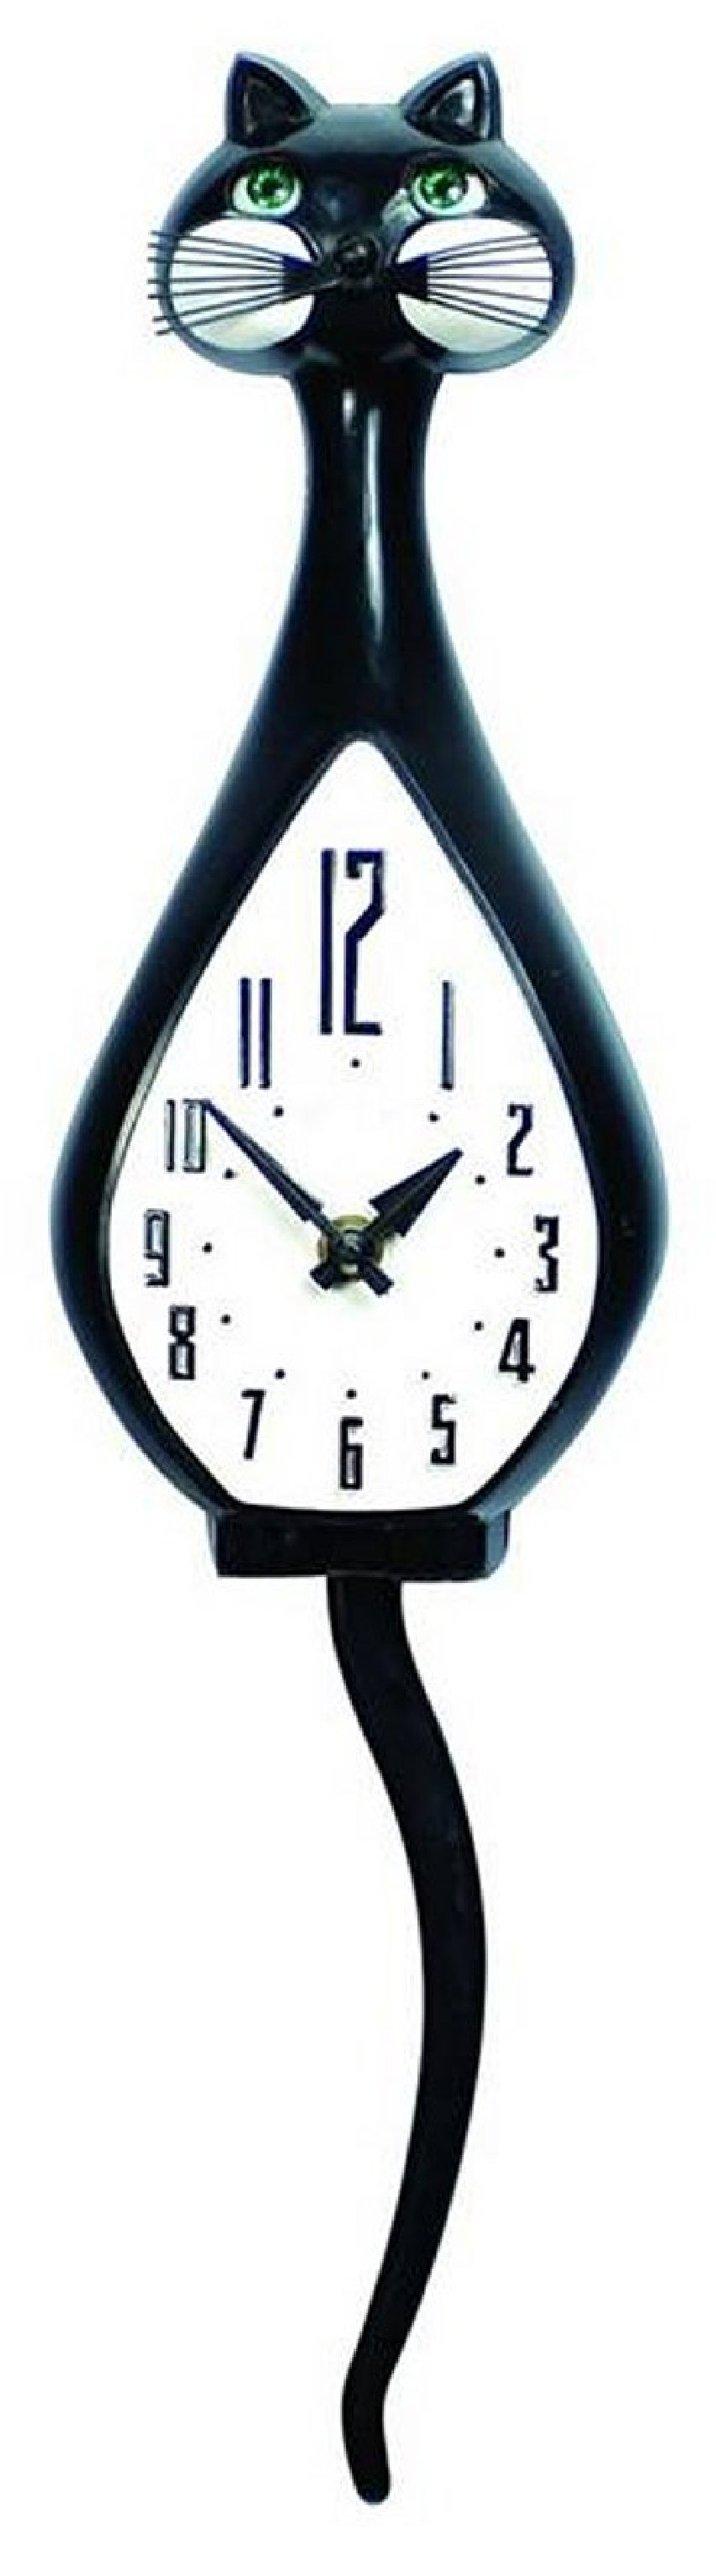 Simone Black Animated Wall Clock